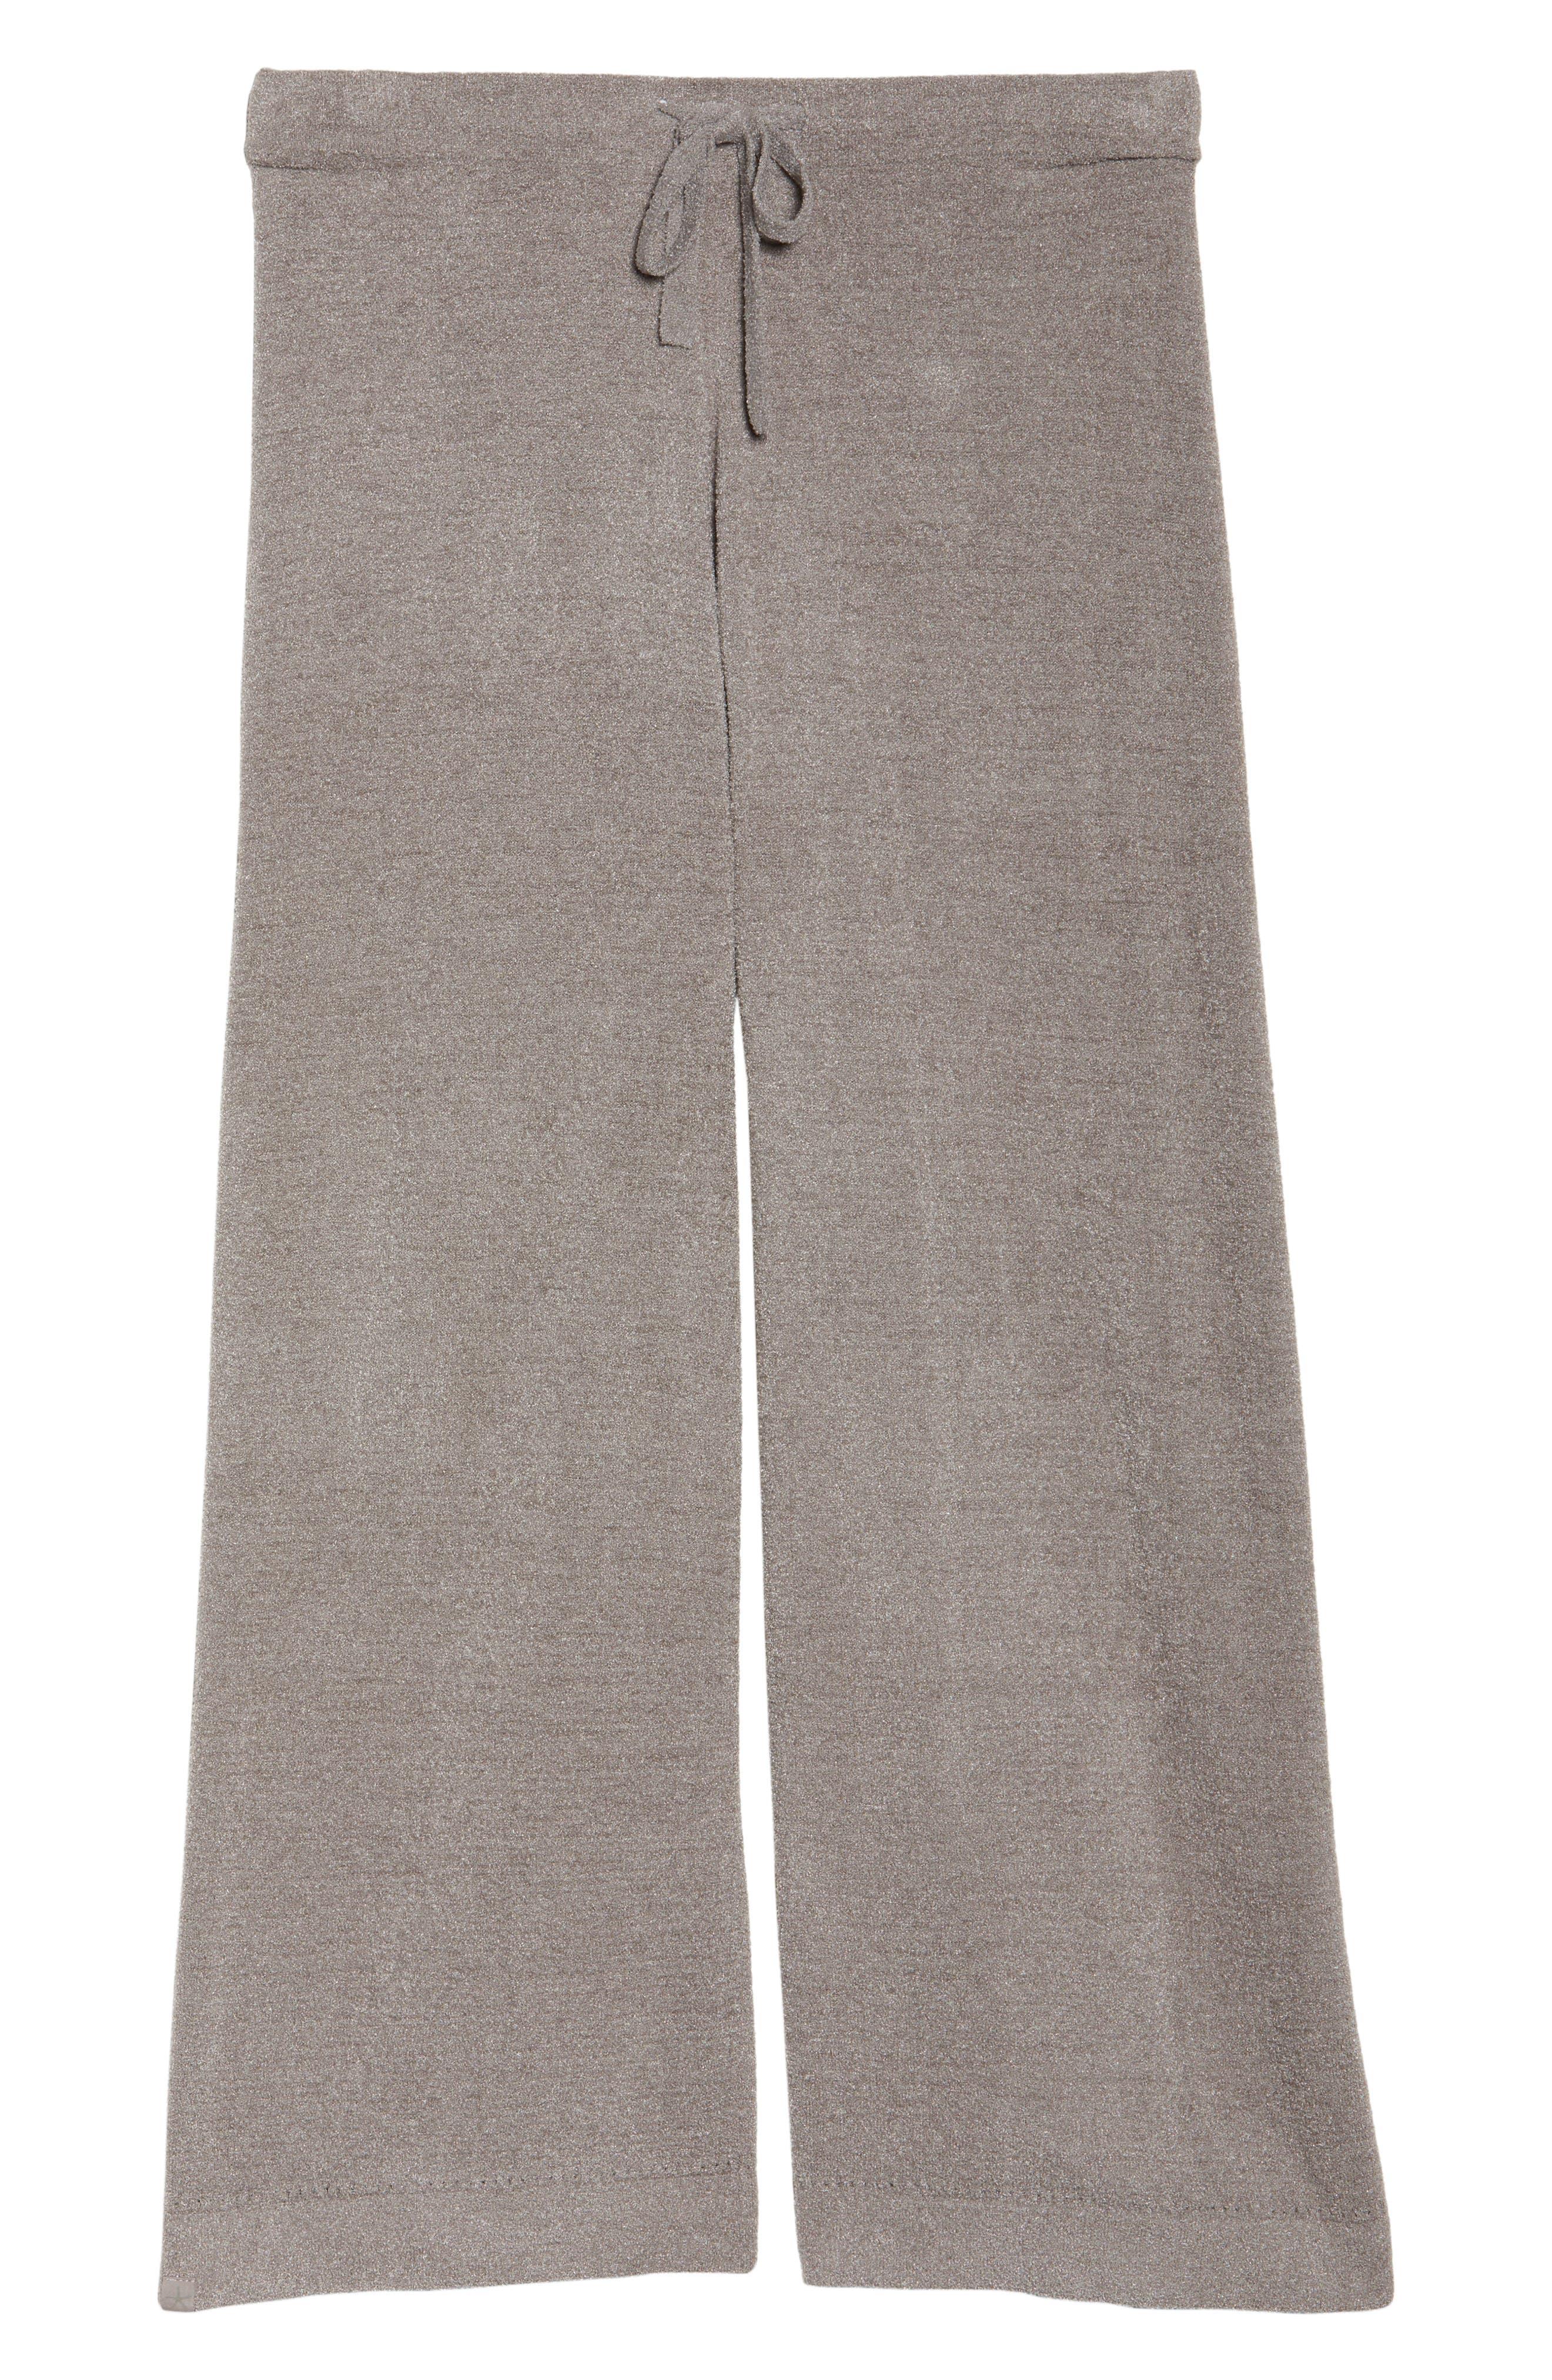 Cozychic Ultra Lite<sup>®</sup> Culotte Lounge Pants,                             Alternate thumbnail 6, color,                             081